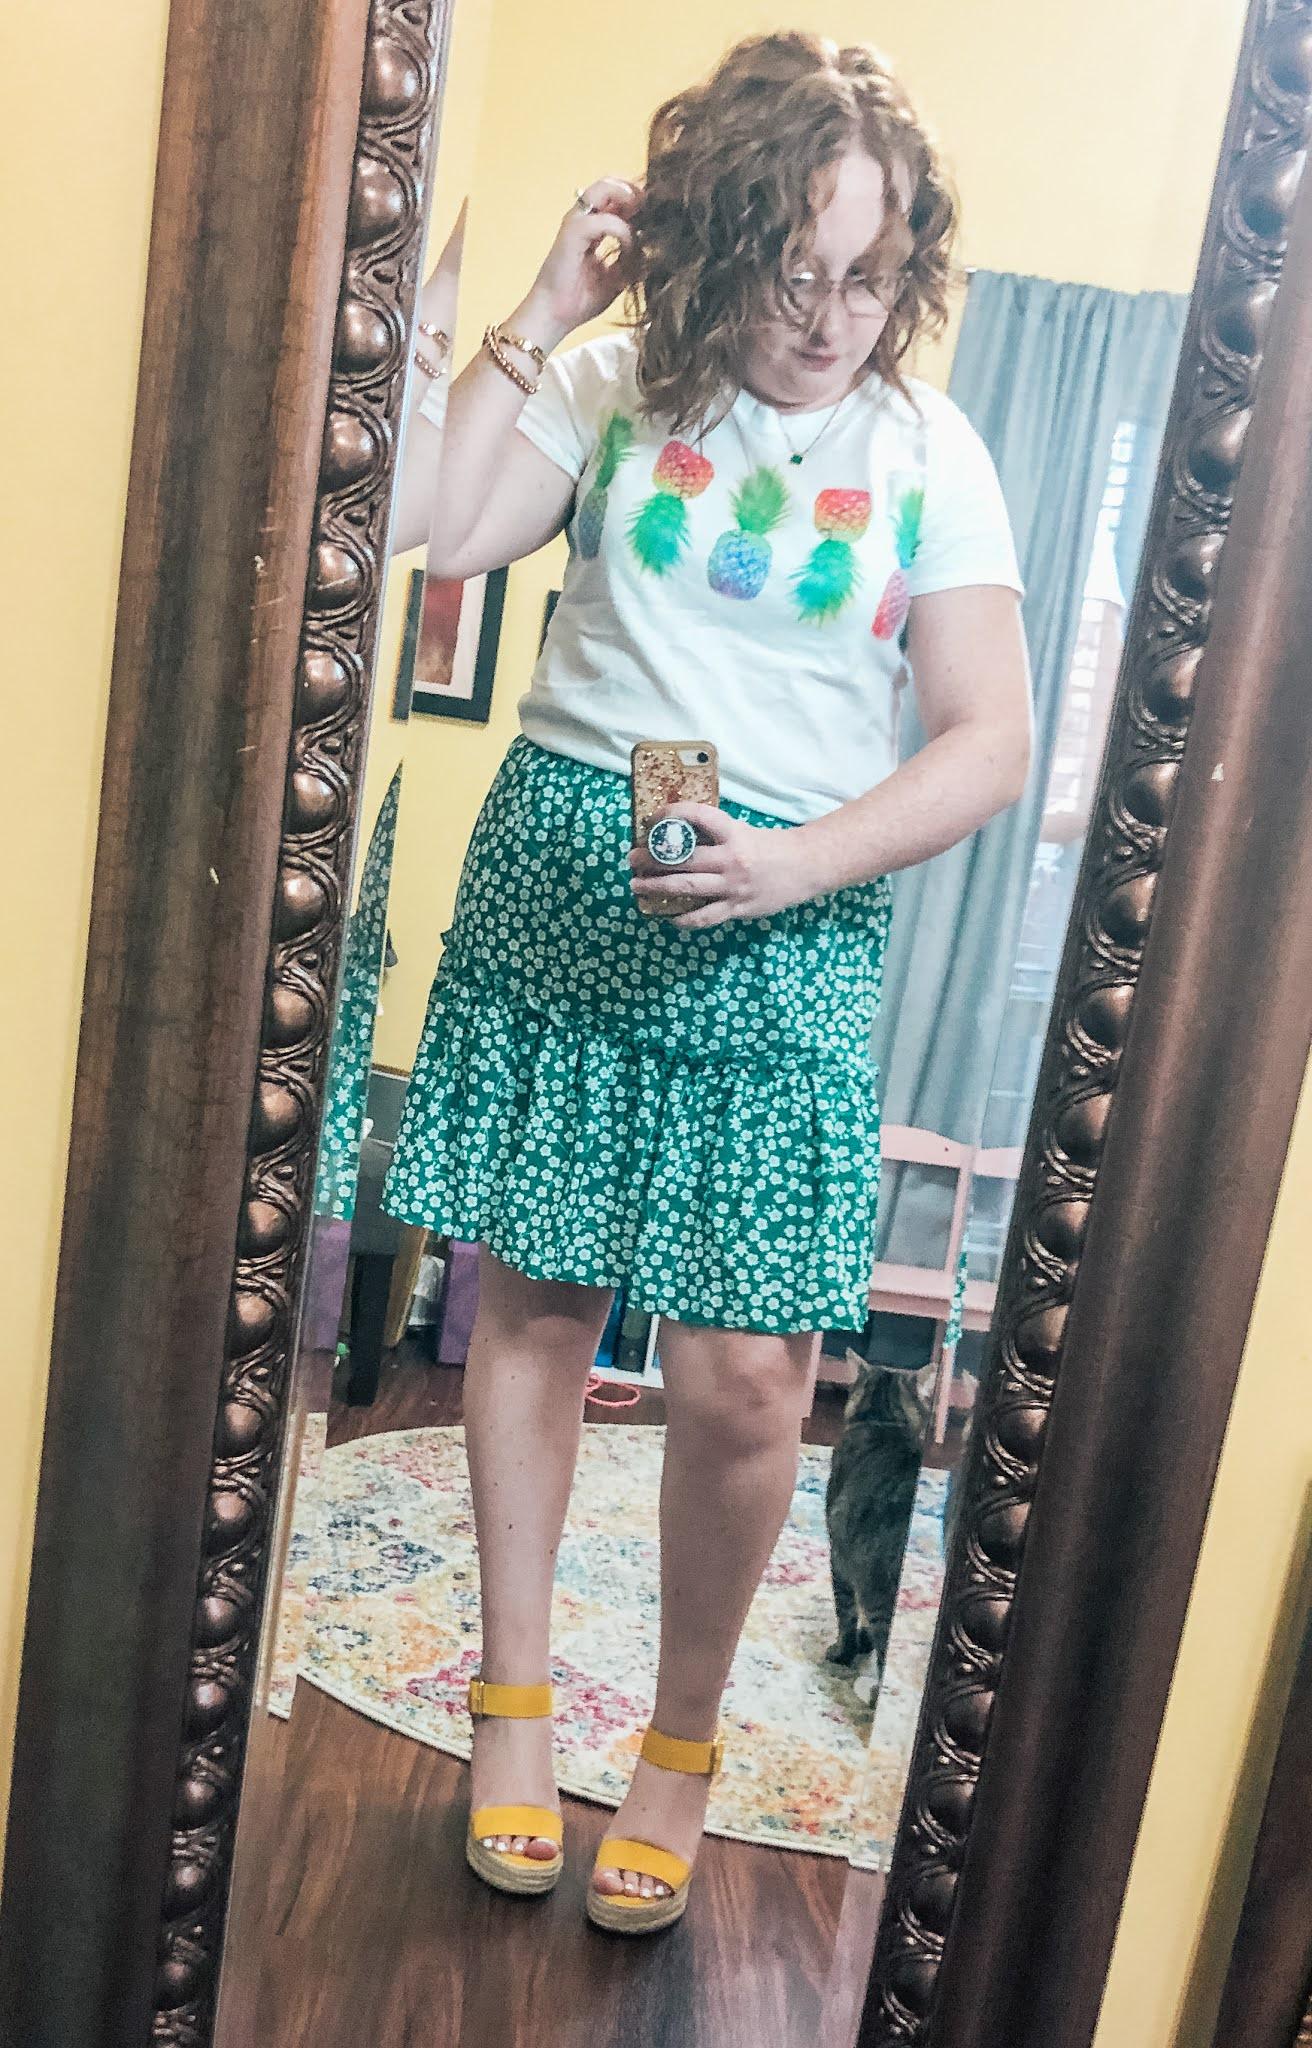 pineapple-tshirt-green-floral-mini-skirt